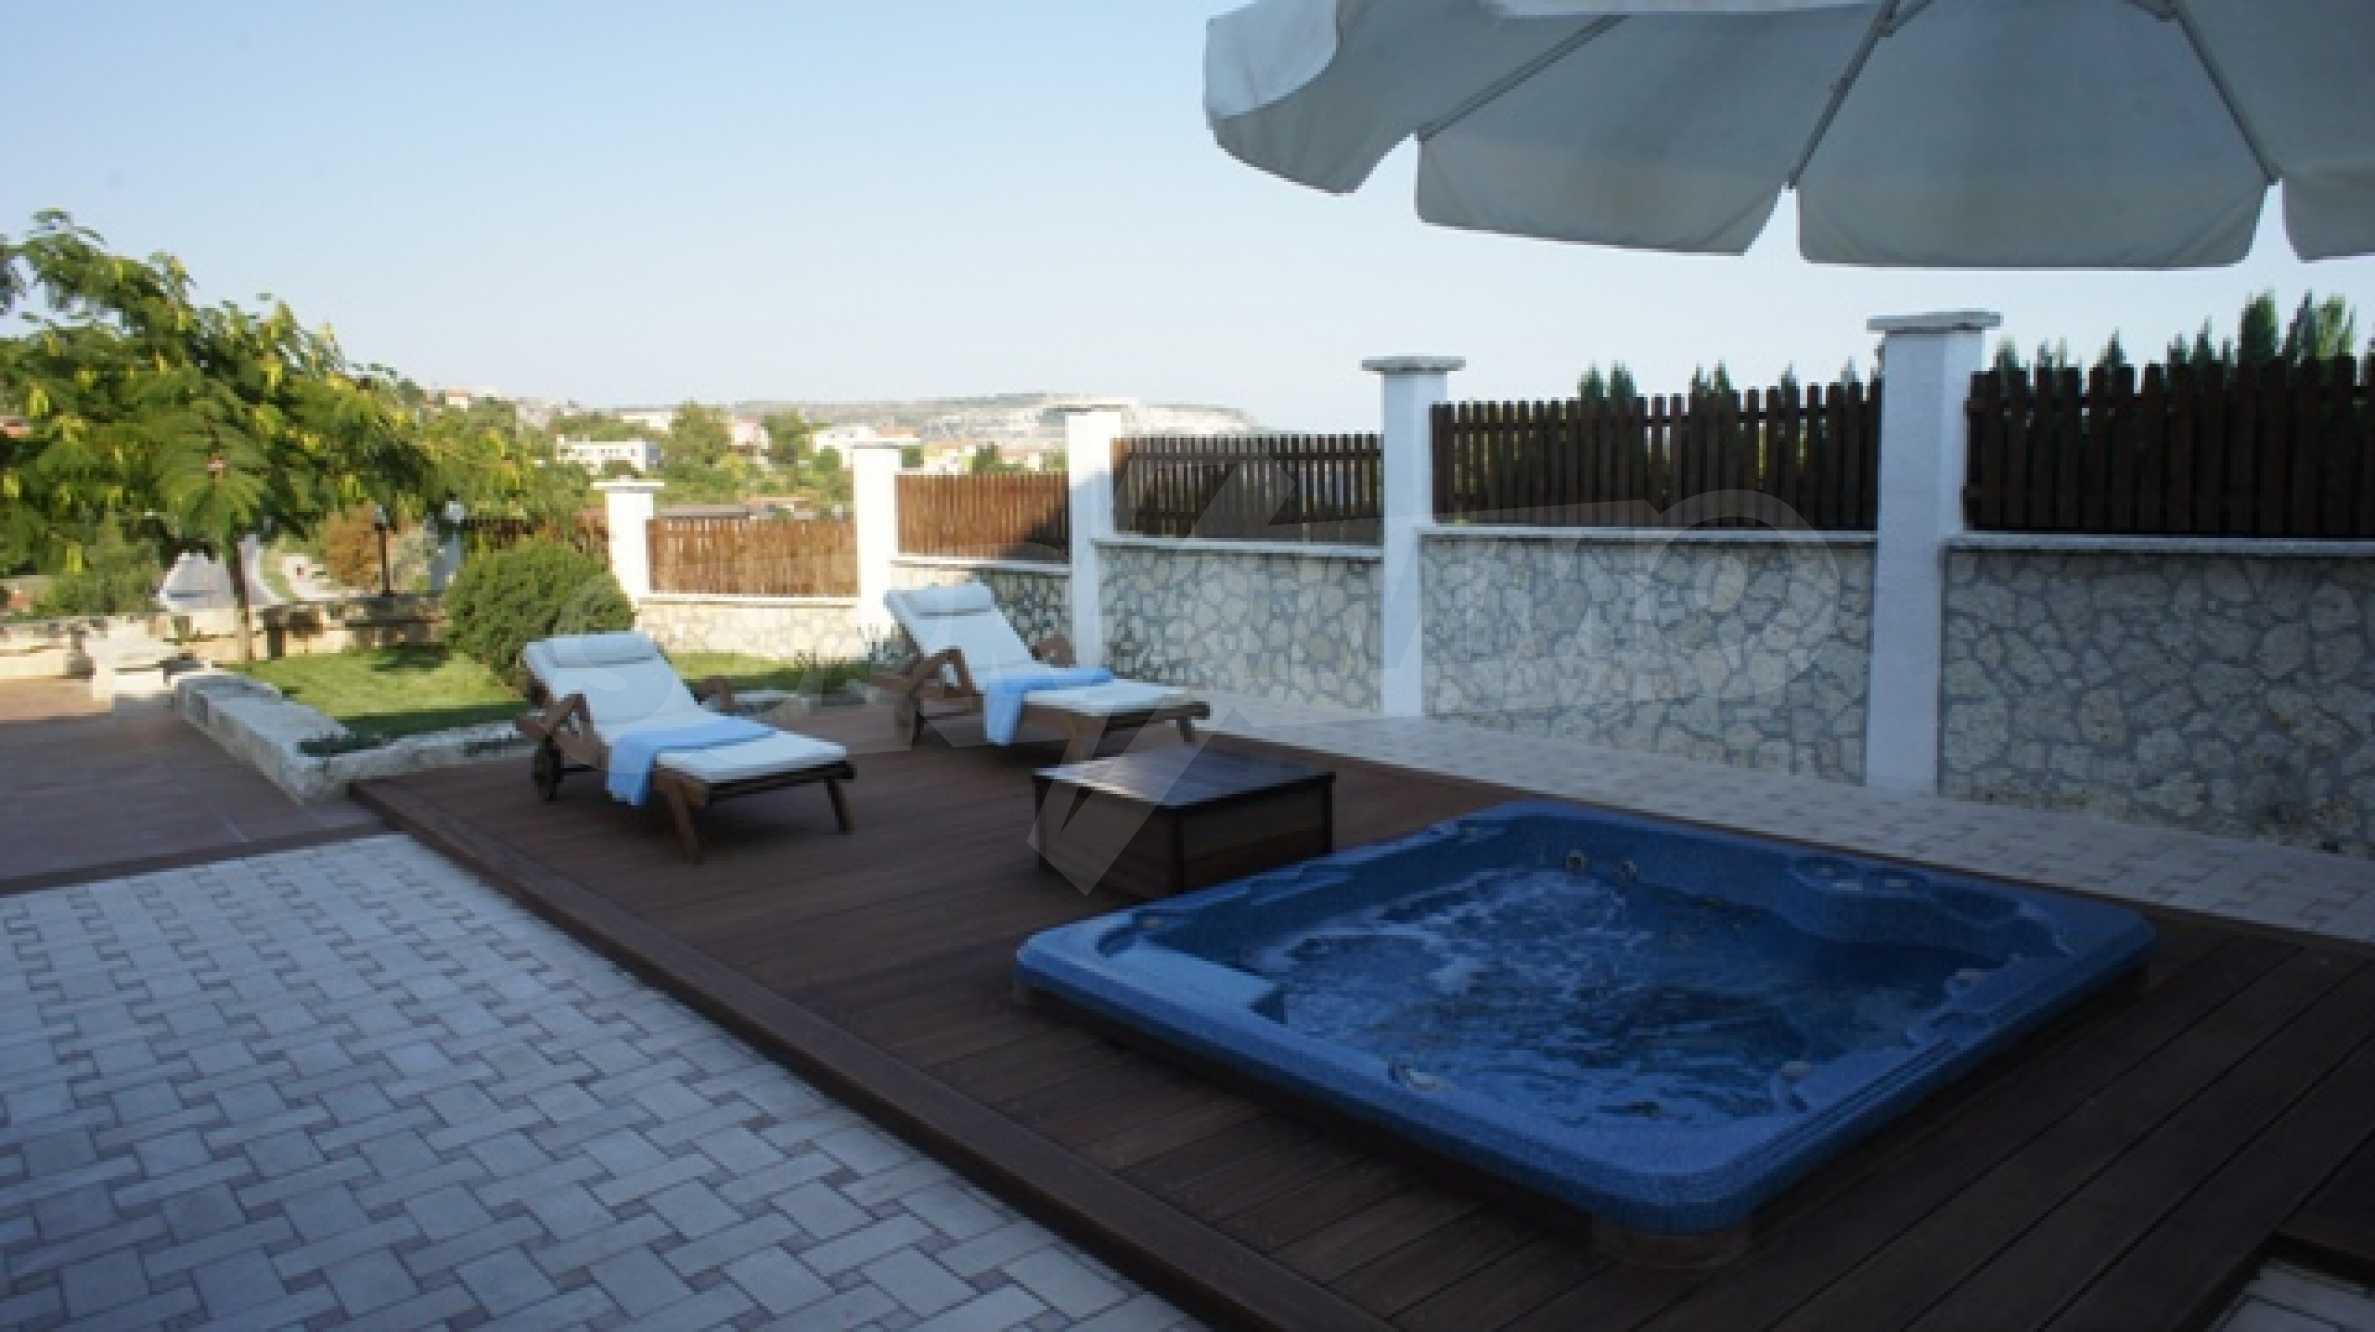 The Mediterranean style - a sense of luxury 21